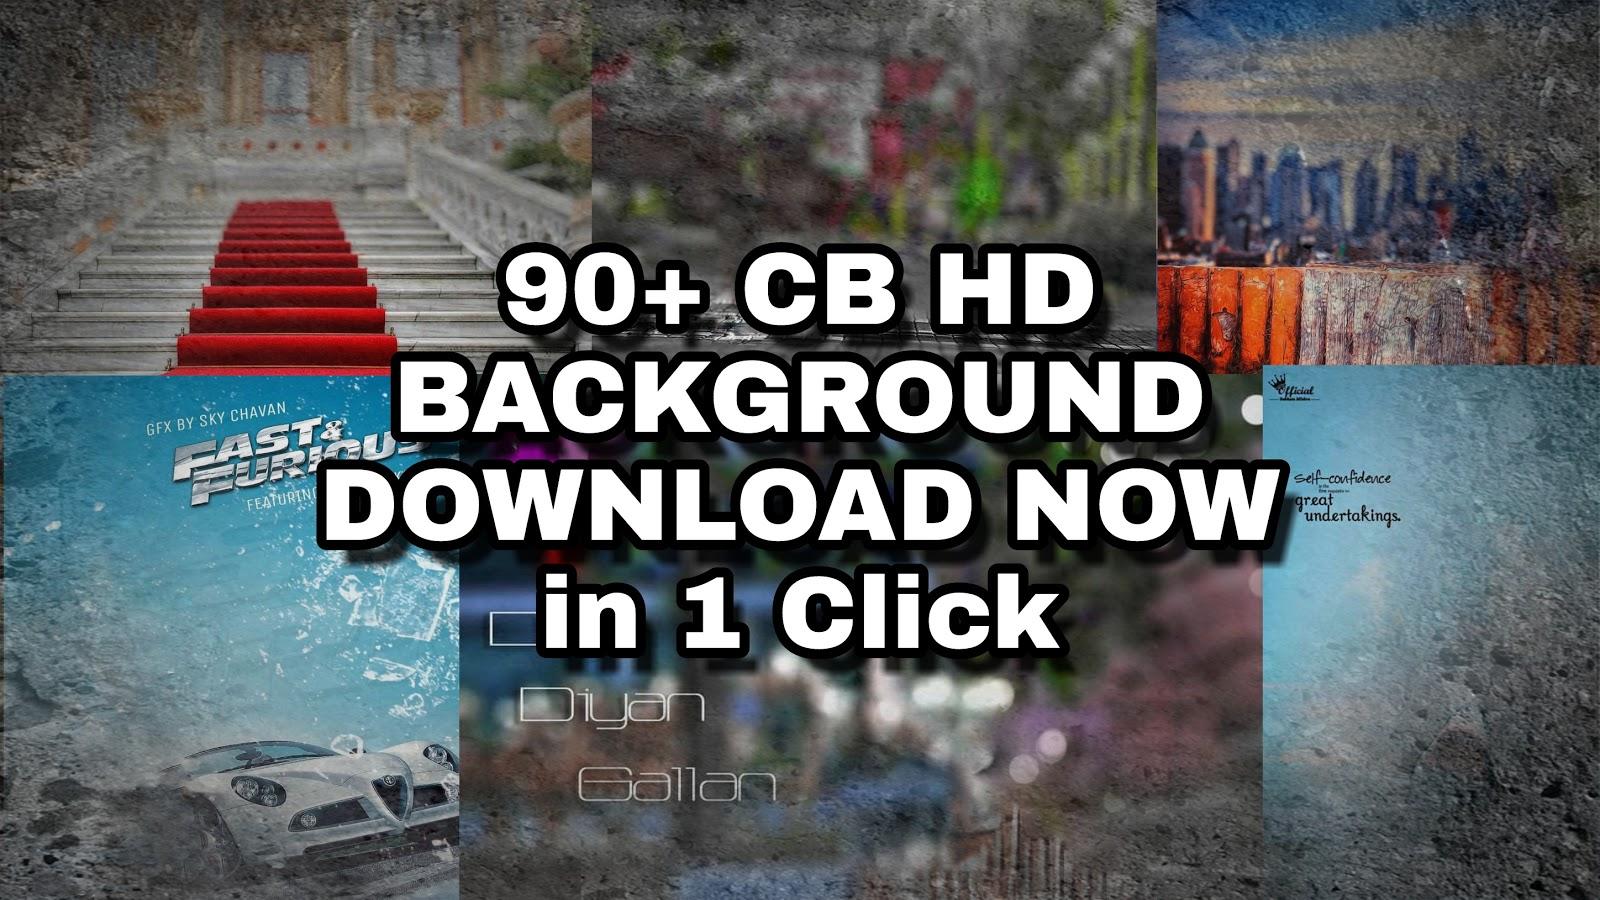 Cb Edits Background Download Zip File - BerkshireRegion